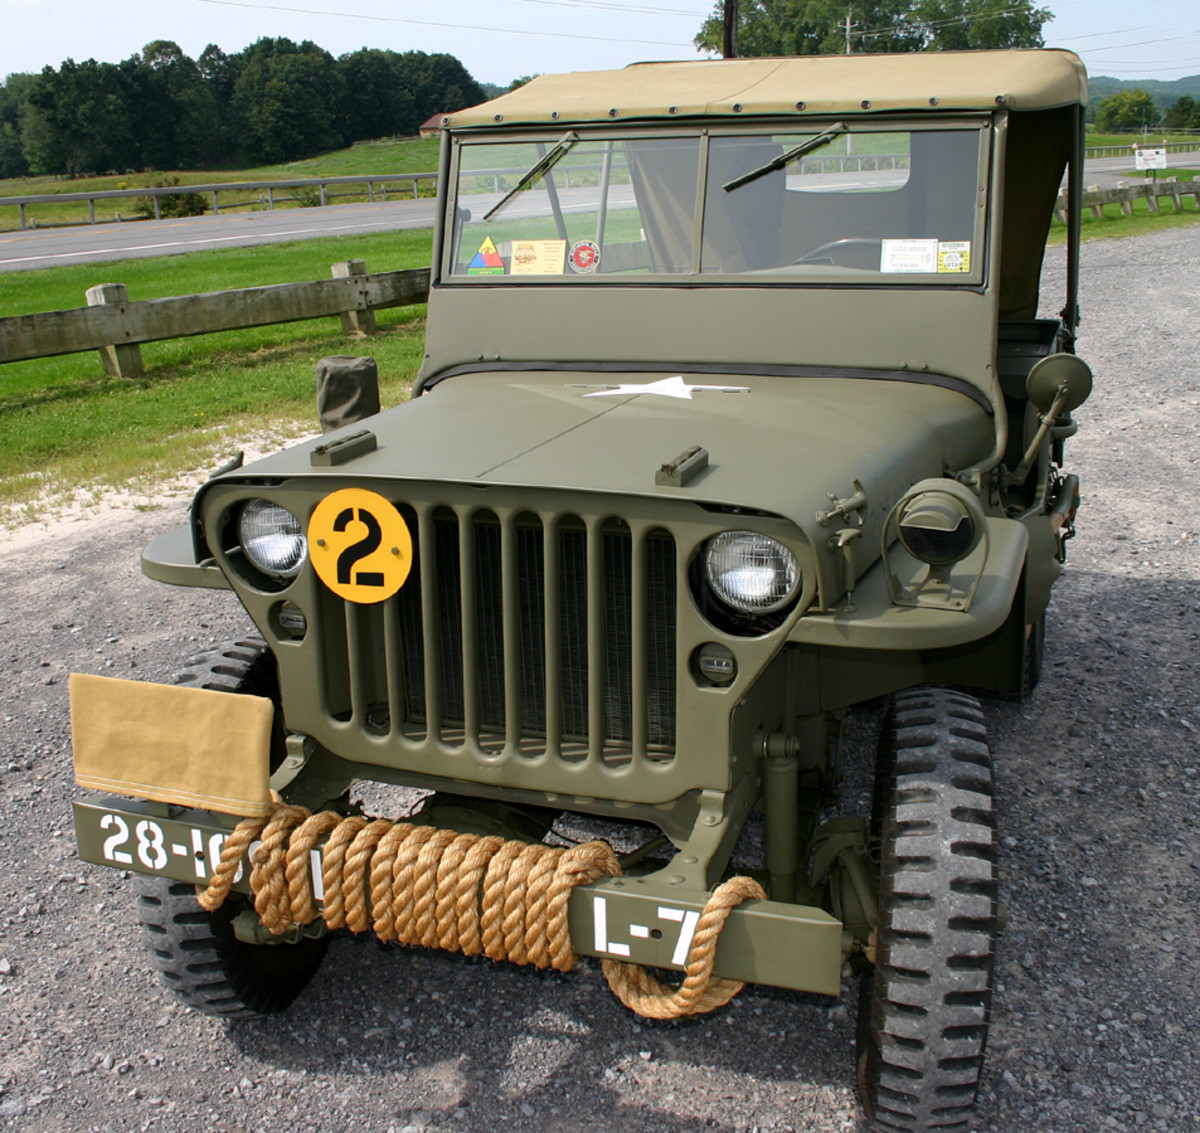 Richard Senge's 1944 GPW. He restored it over the 2013-2021.